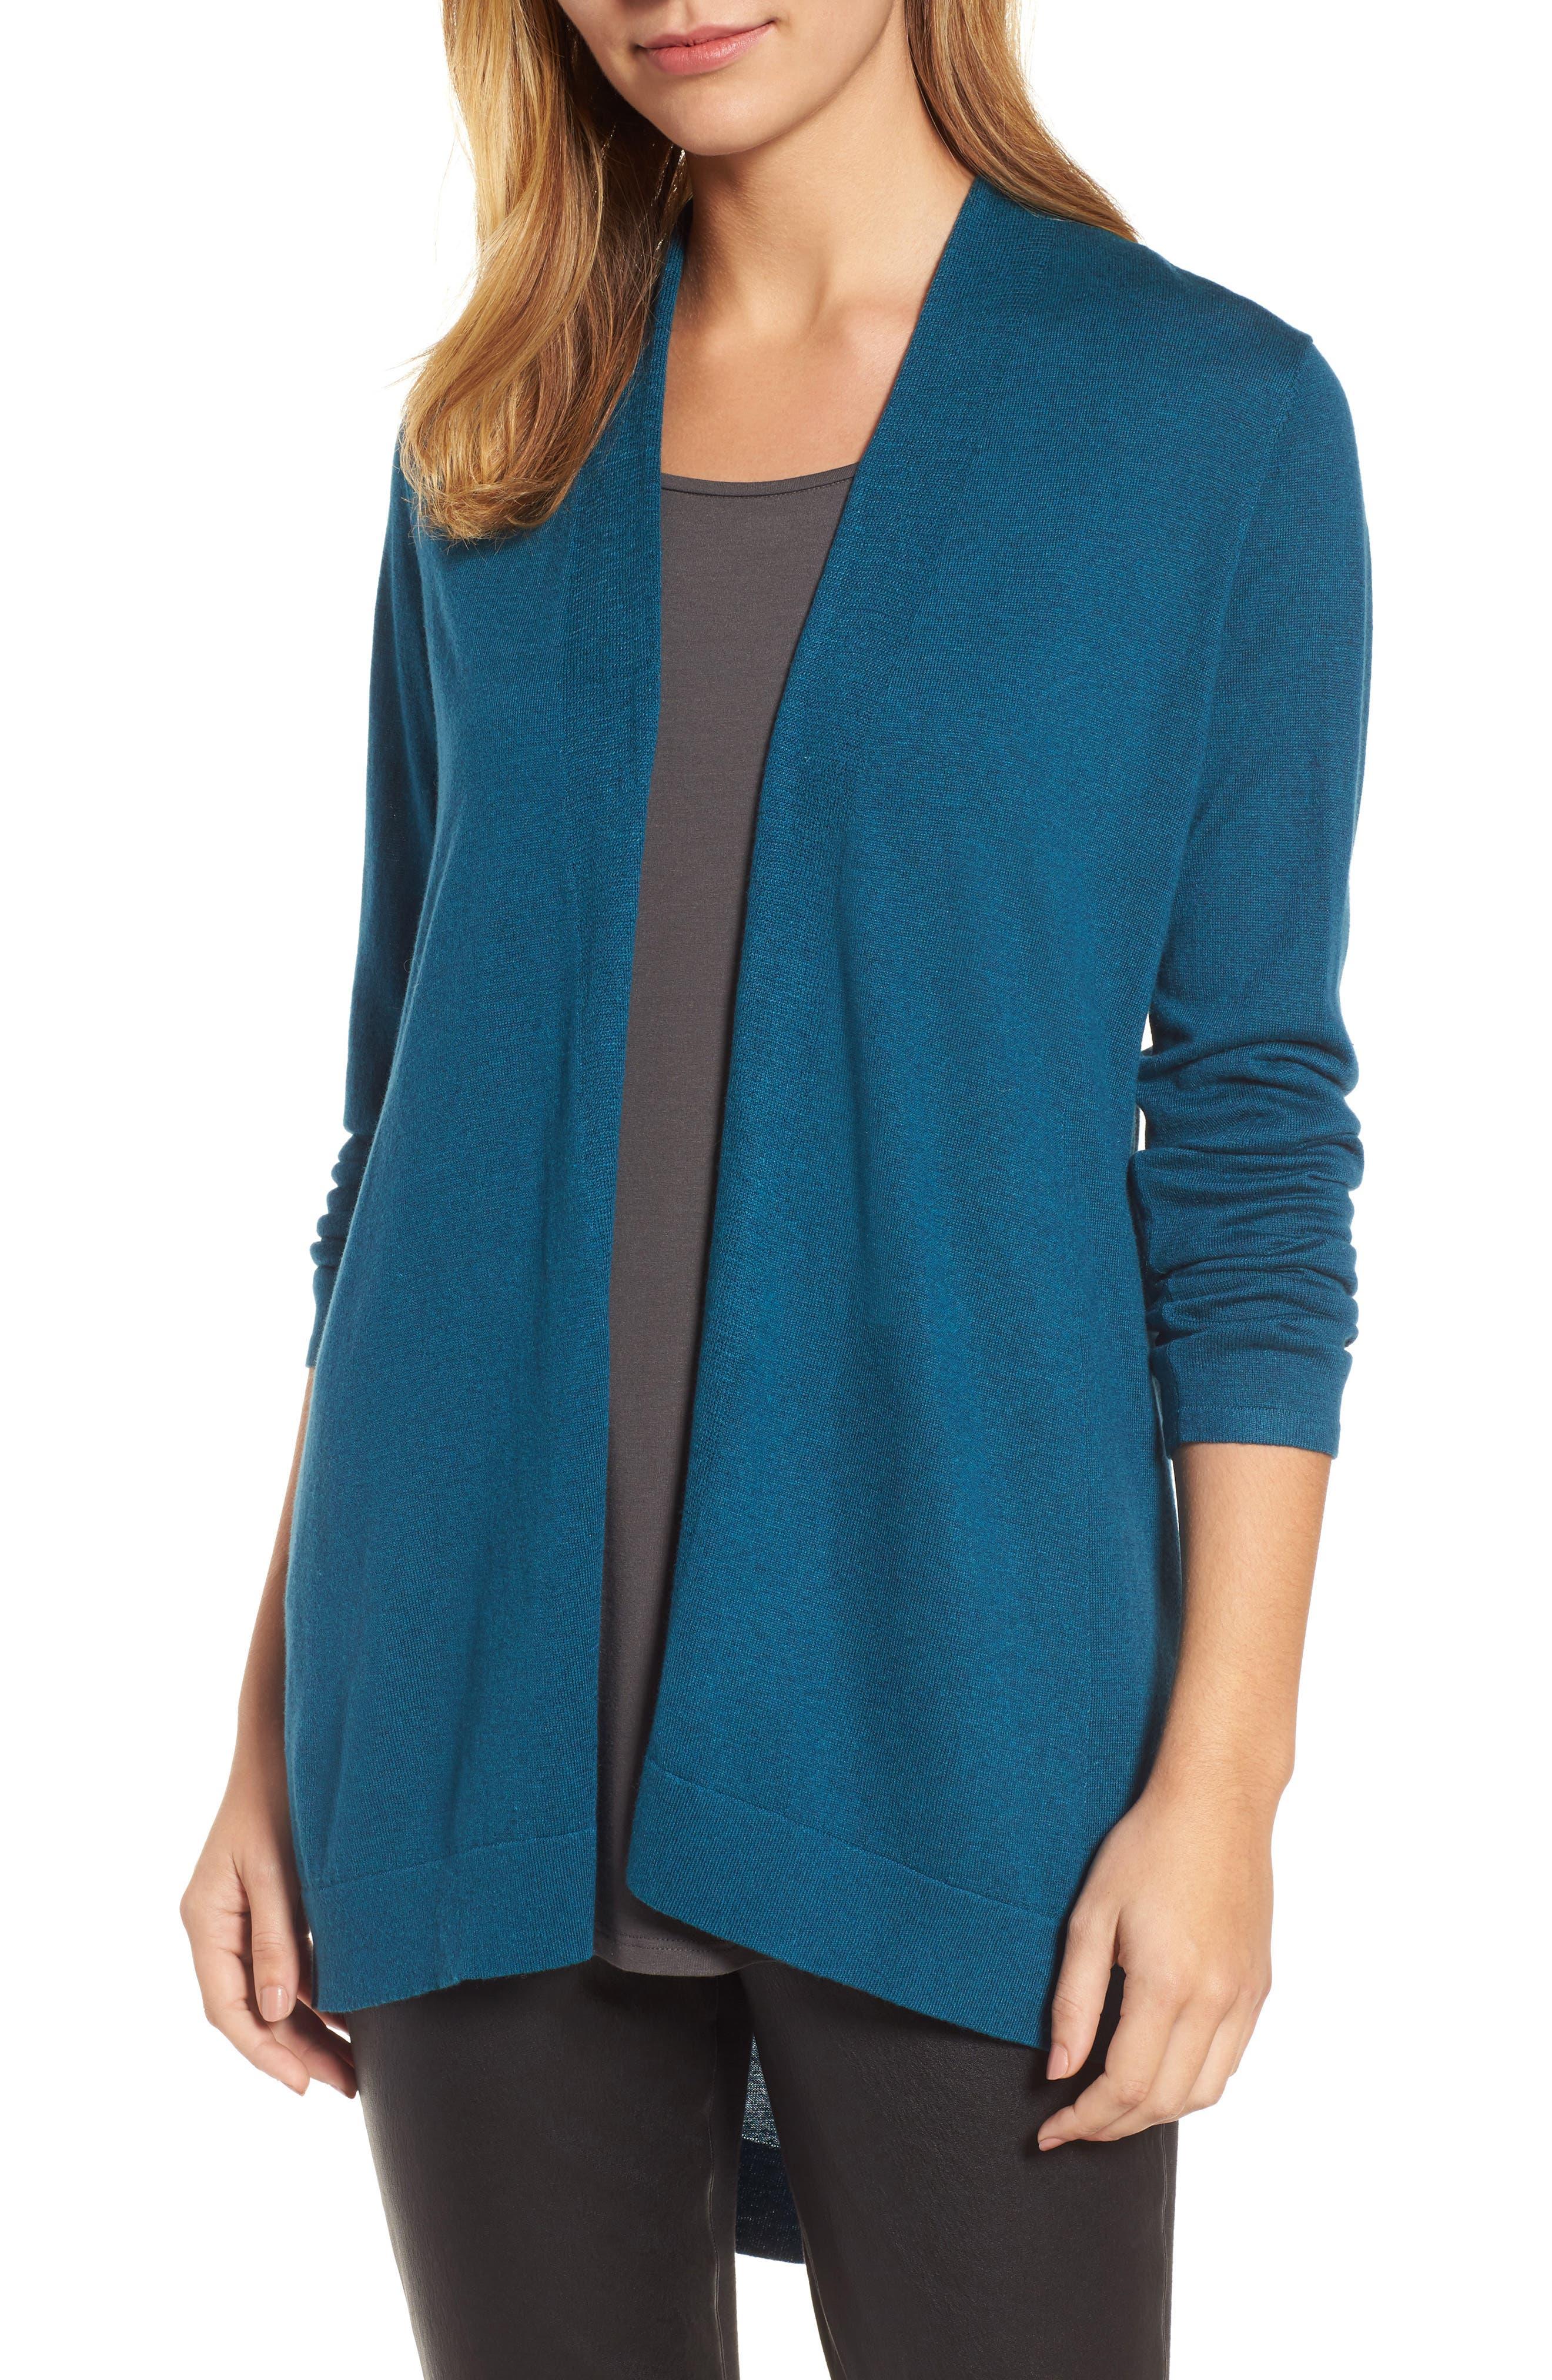 Eileen Fisher Shaped Tencel® Blend Cardigan